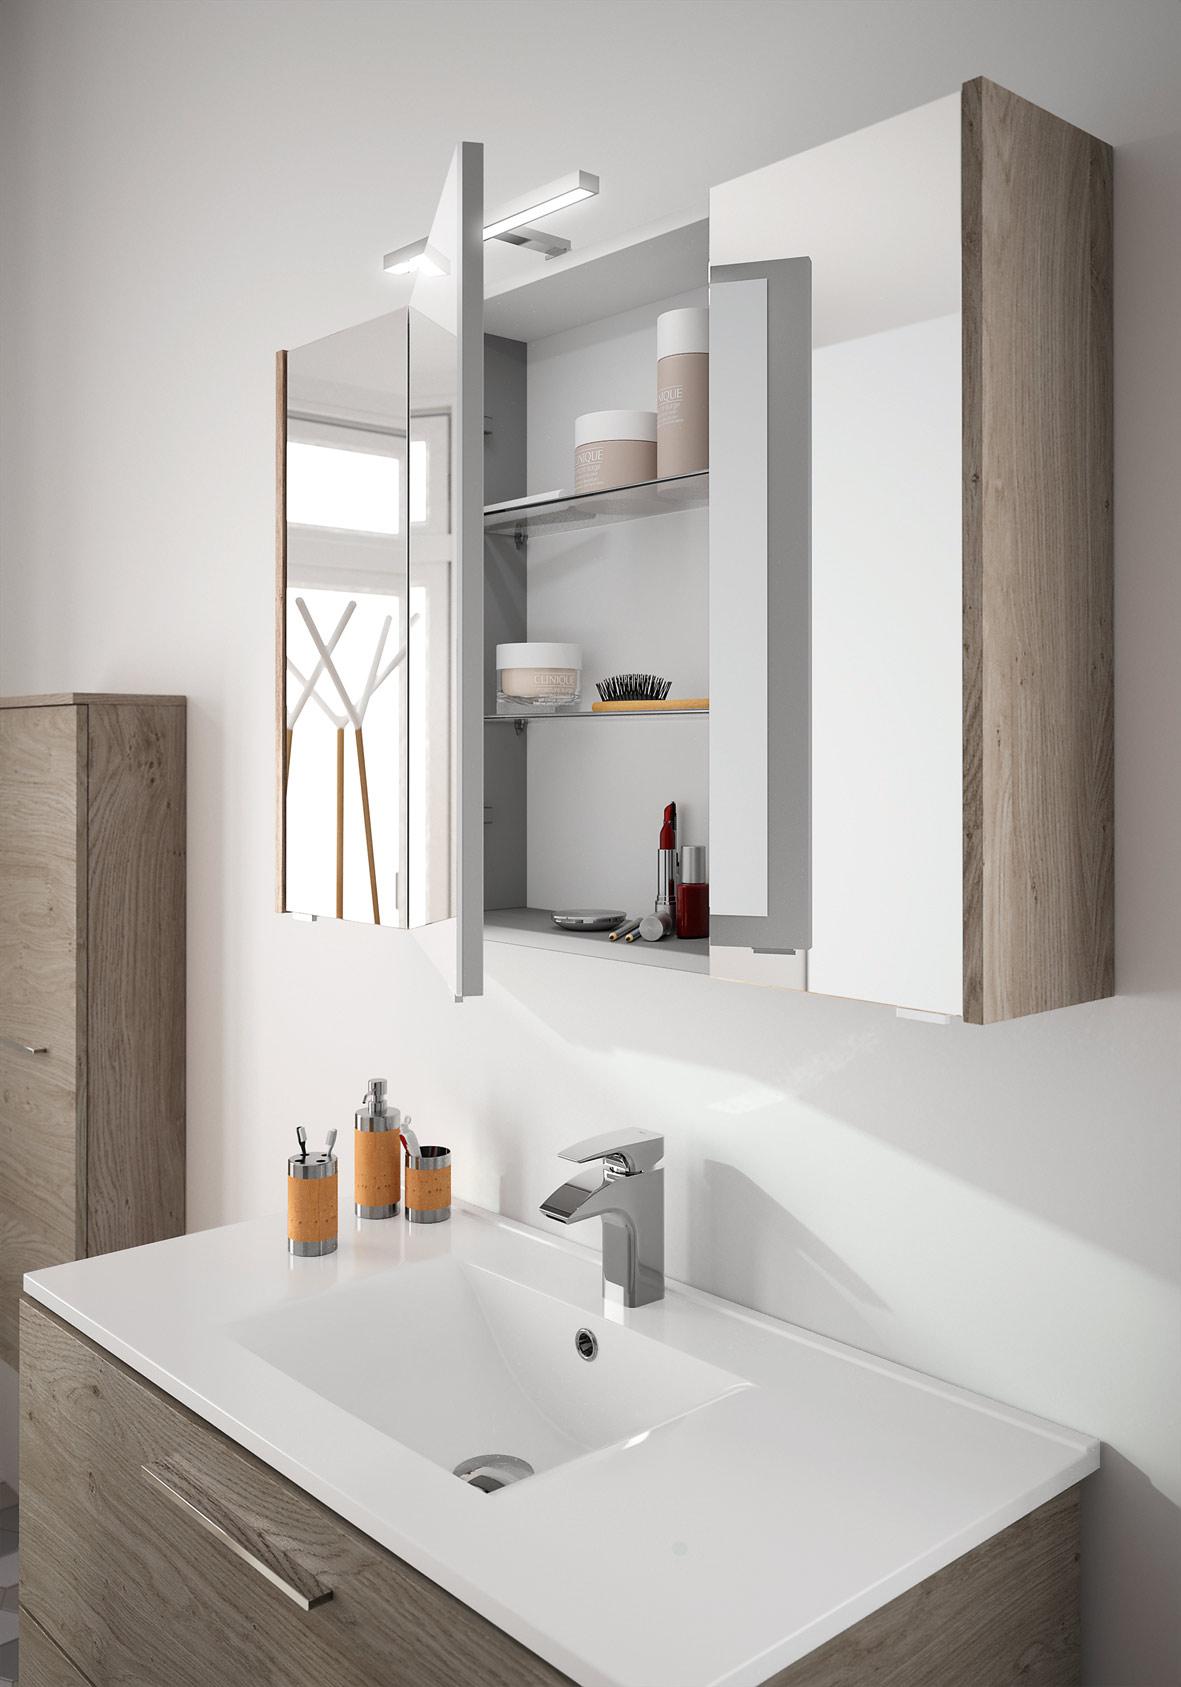 laura meubles de salle de bains baignoires fabricant fran ais cedam. Black Bedroom Furniture Sets. Home Design Ideas